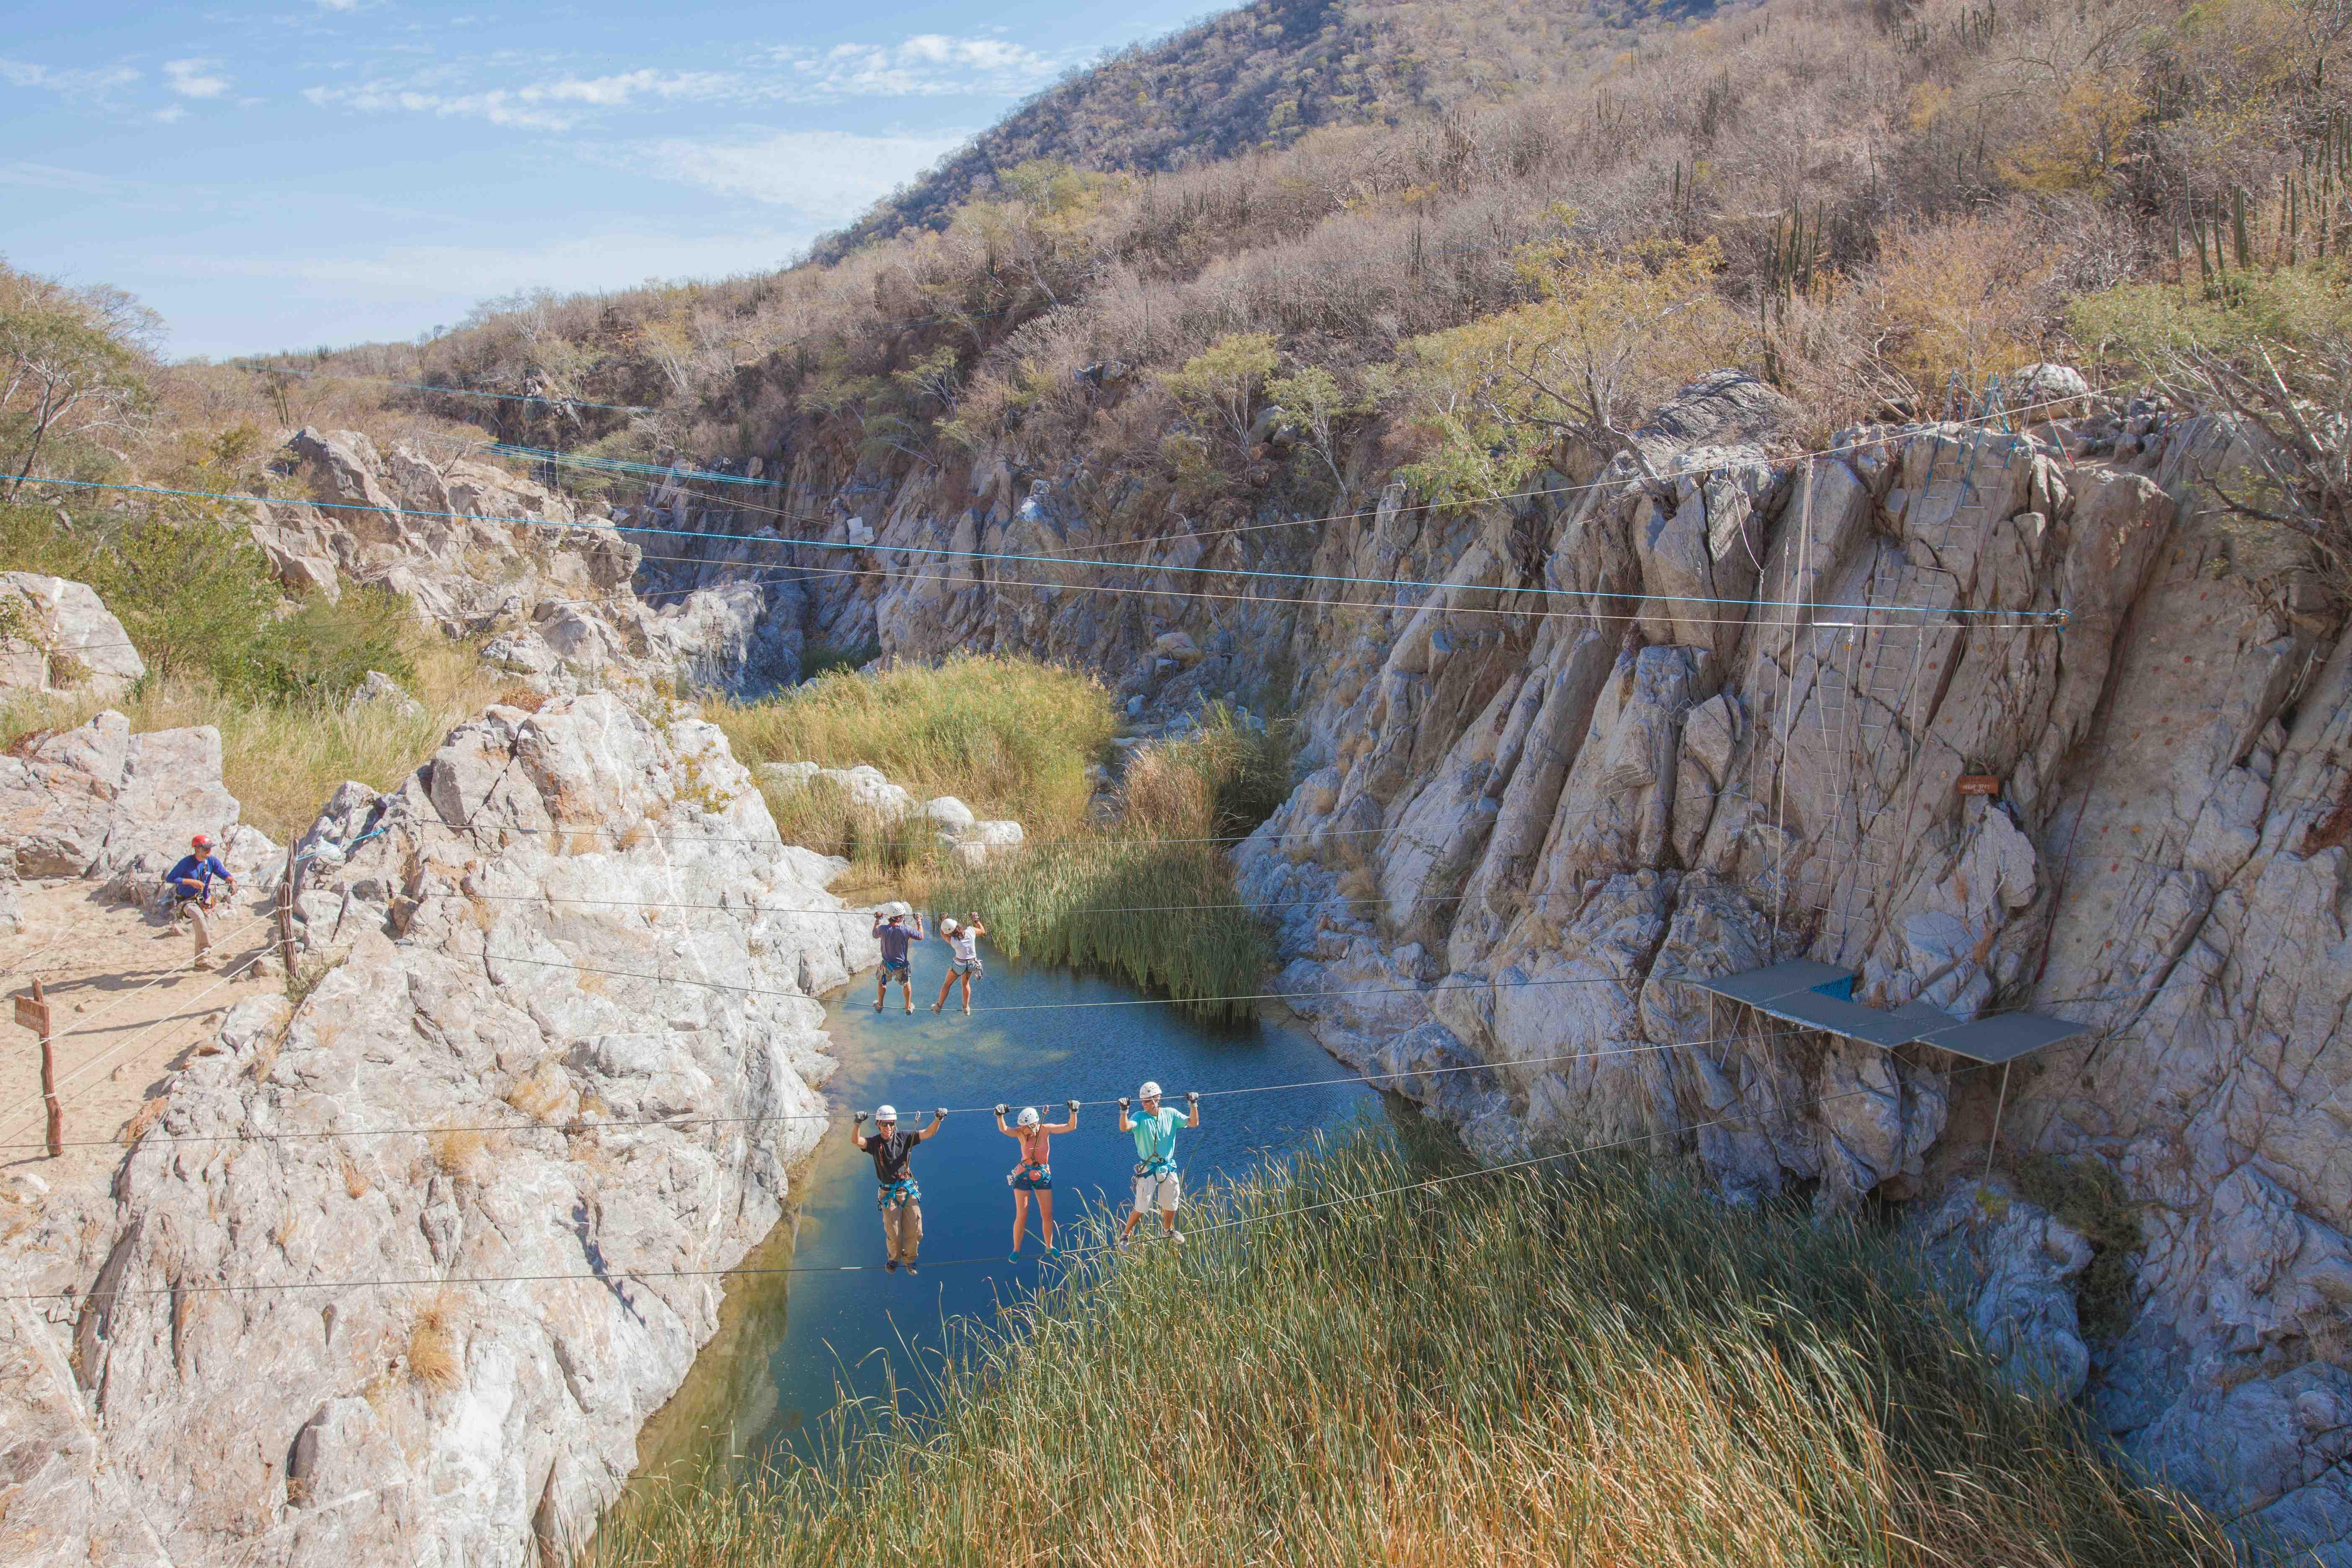 Outdoor Zip Line Adventure Tour - Last Minute Tours in Los Cabos